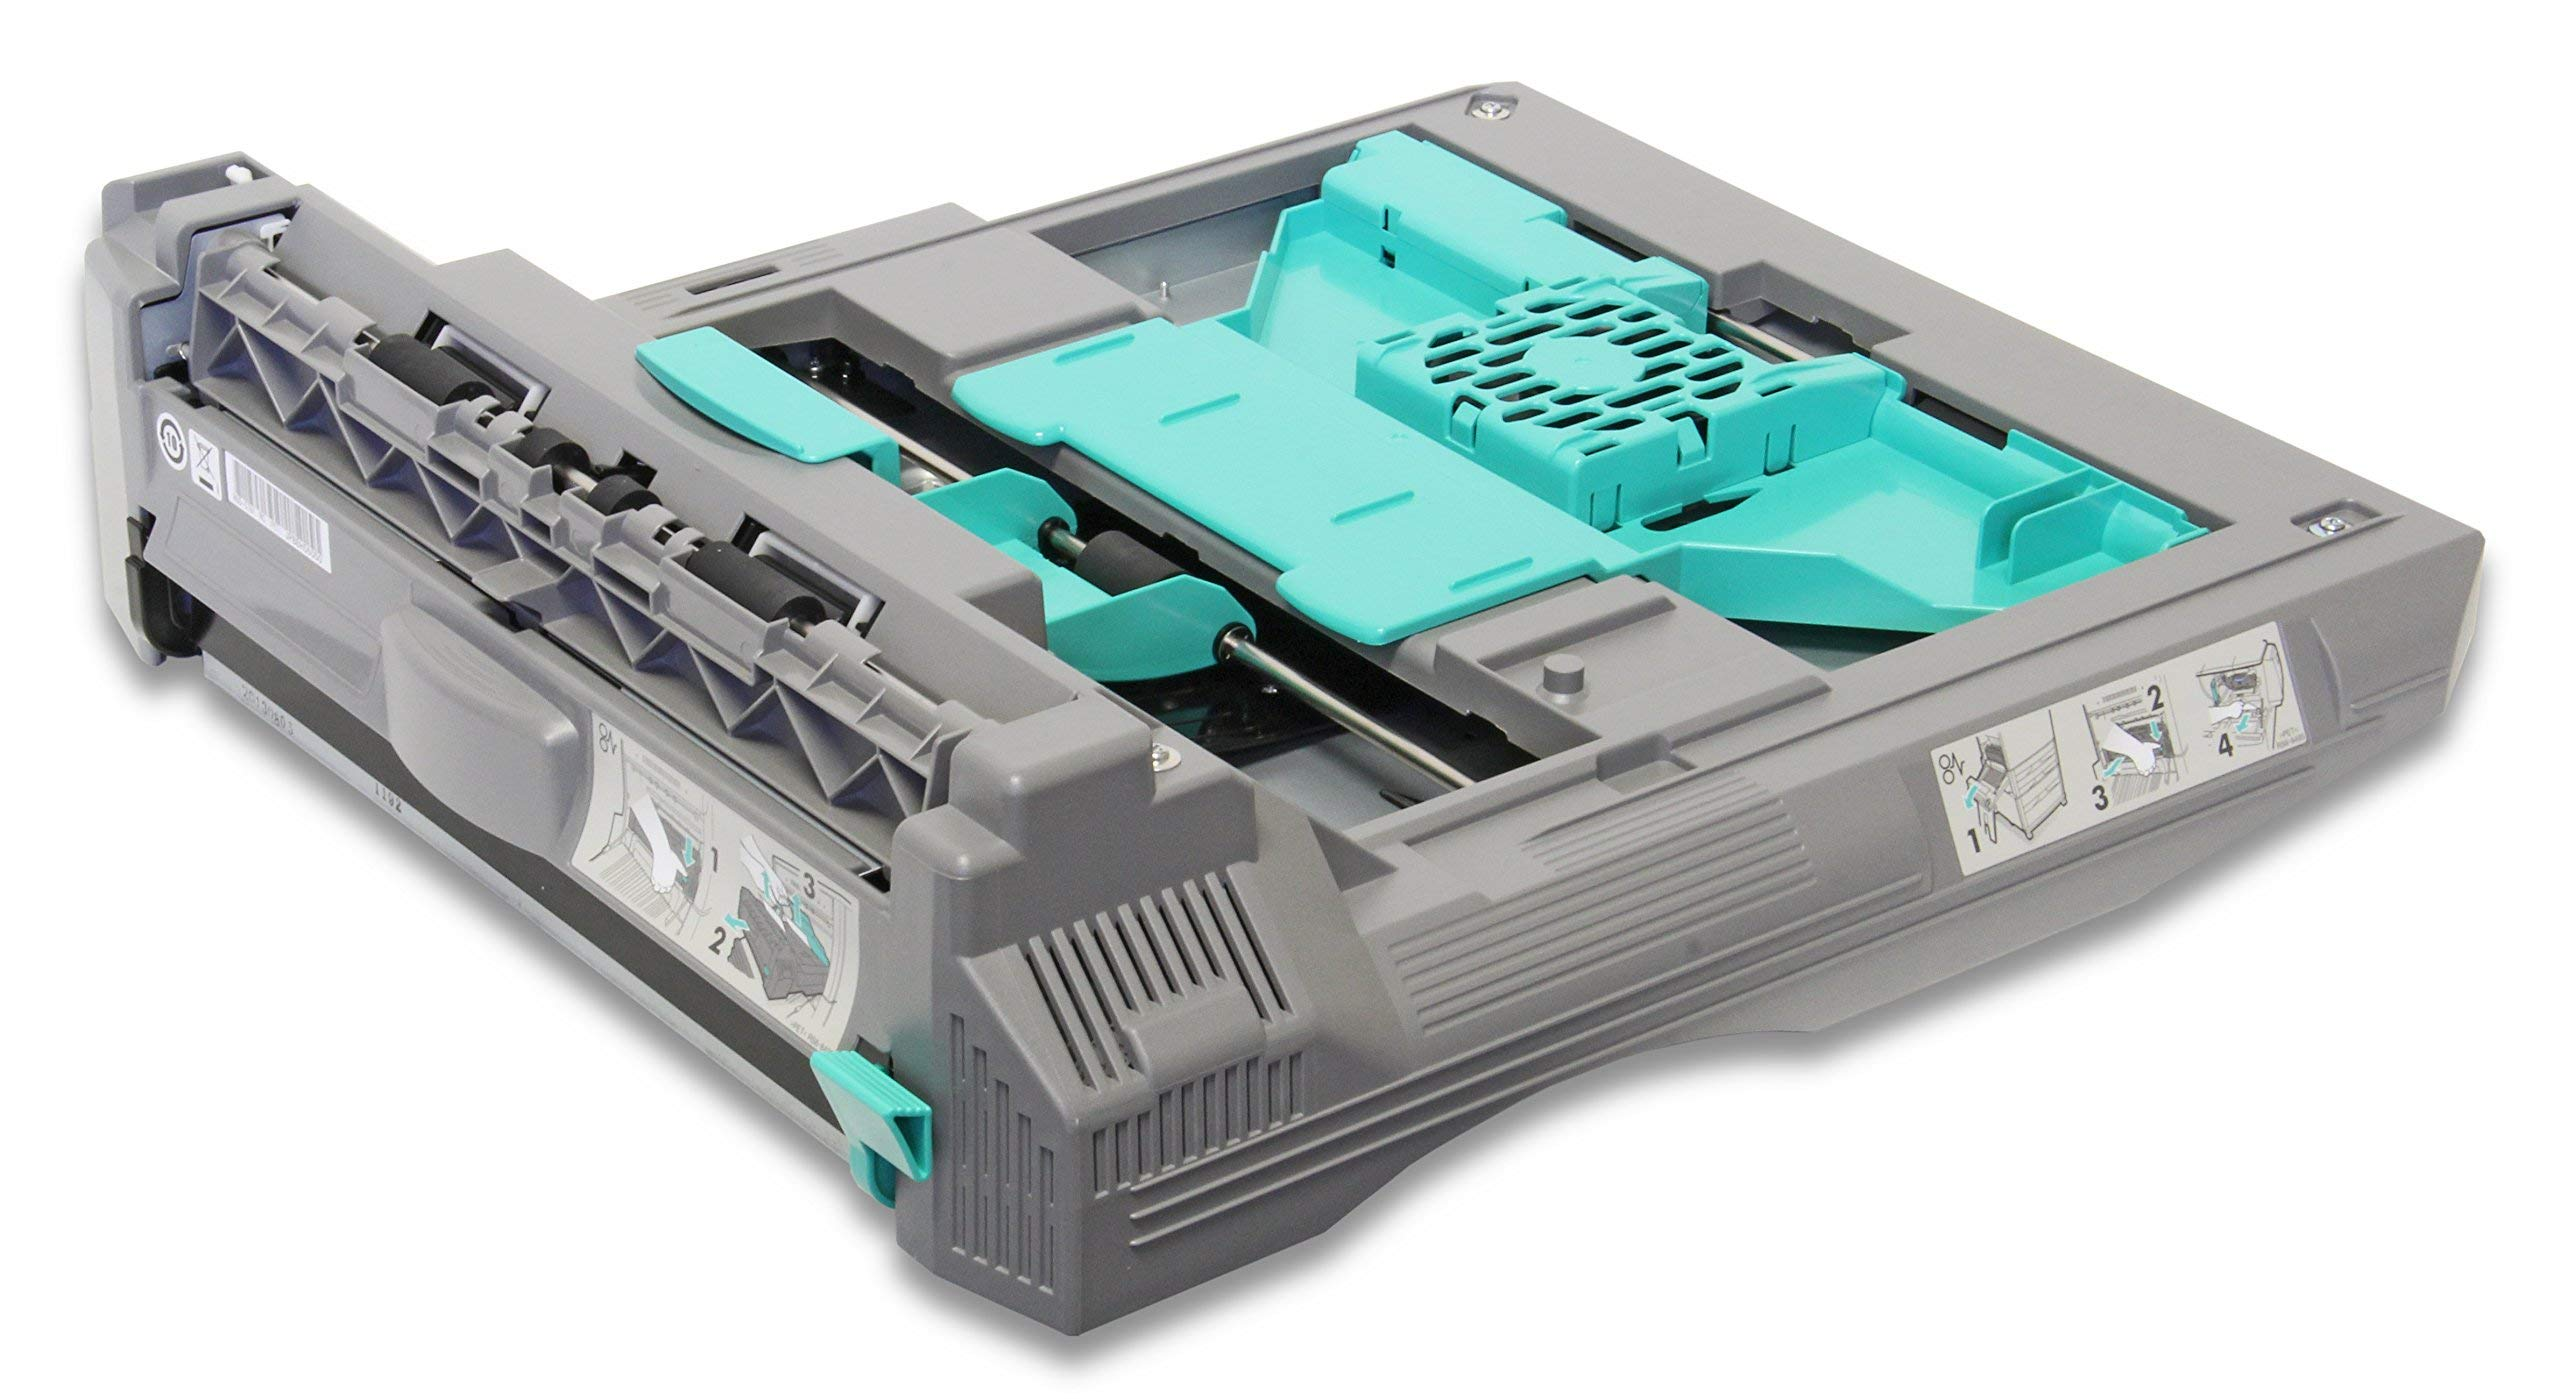 HP LaserJet 9000 9050 Duplexer/Duplex Accessory - C8532A (Renewed) by HP (Image #2)